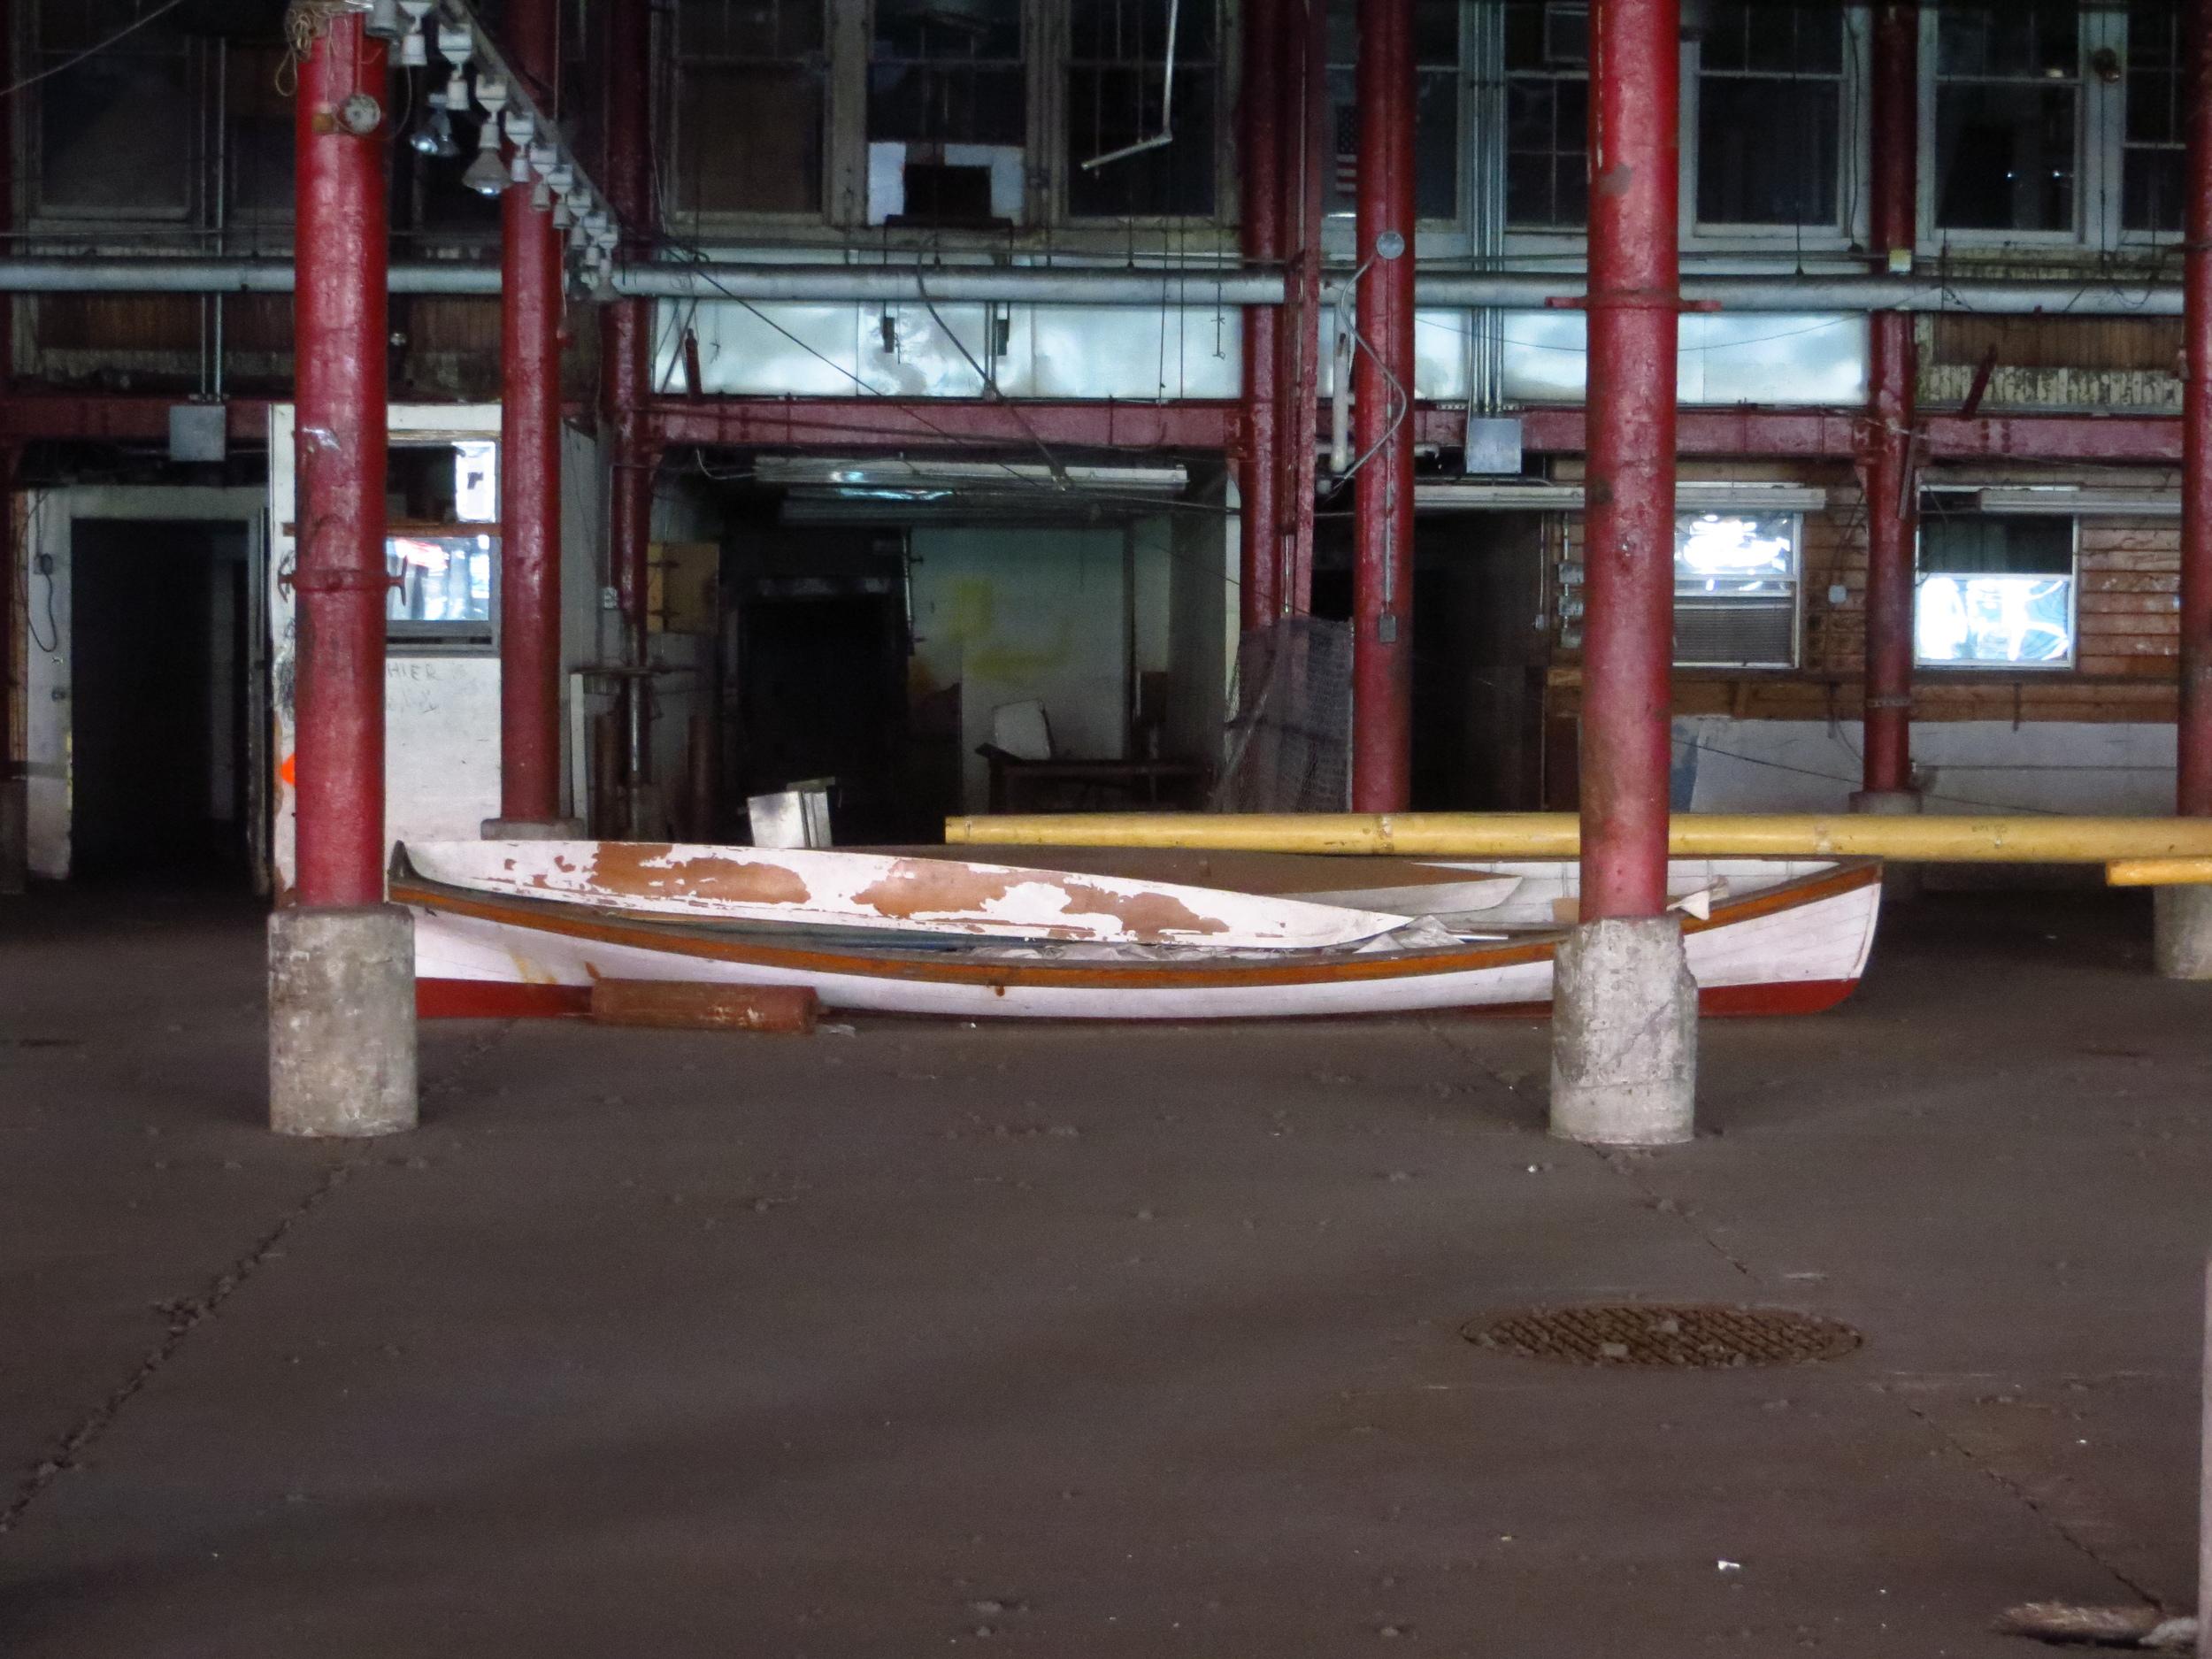 Boat in old fish market